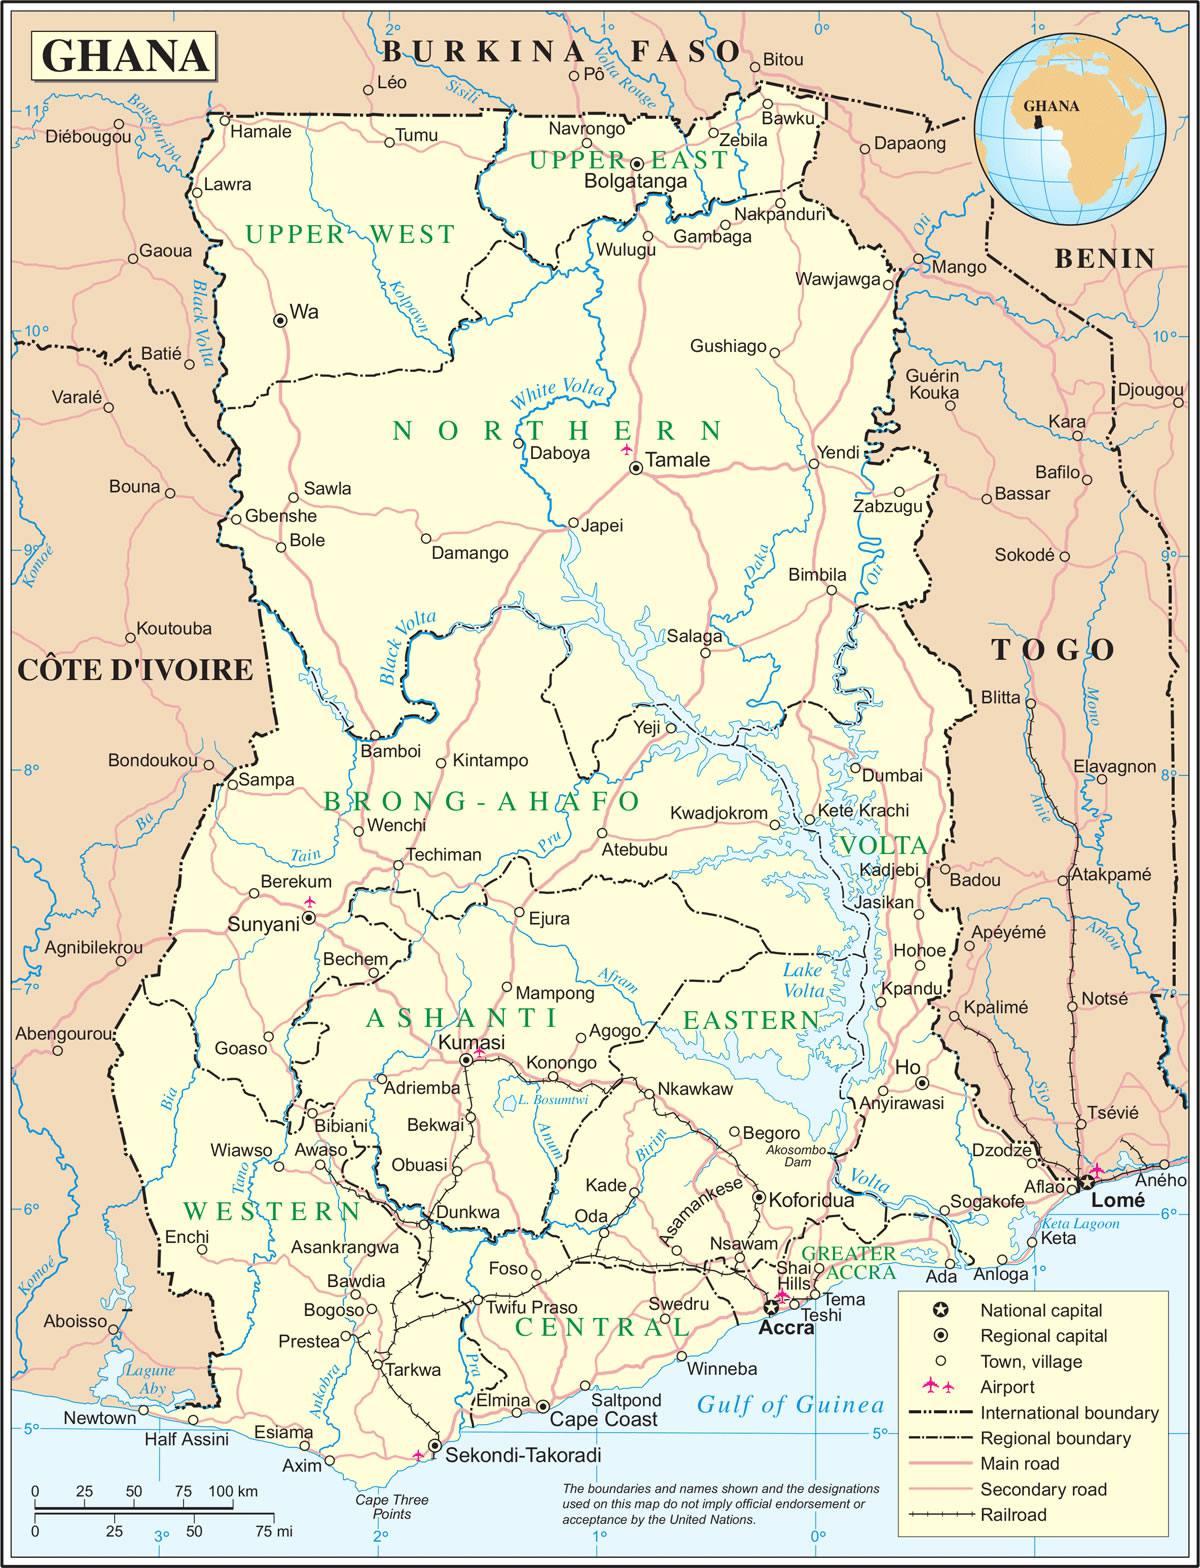 Carte géographique du Ghana